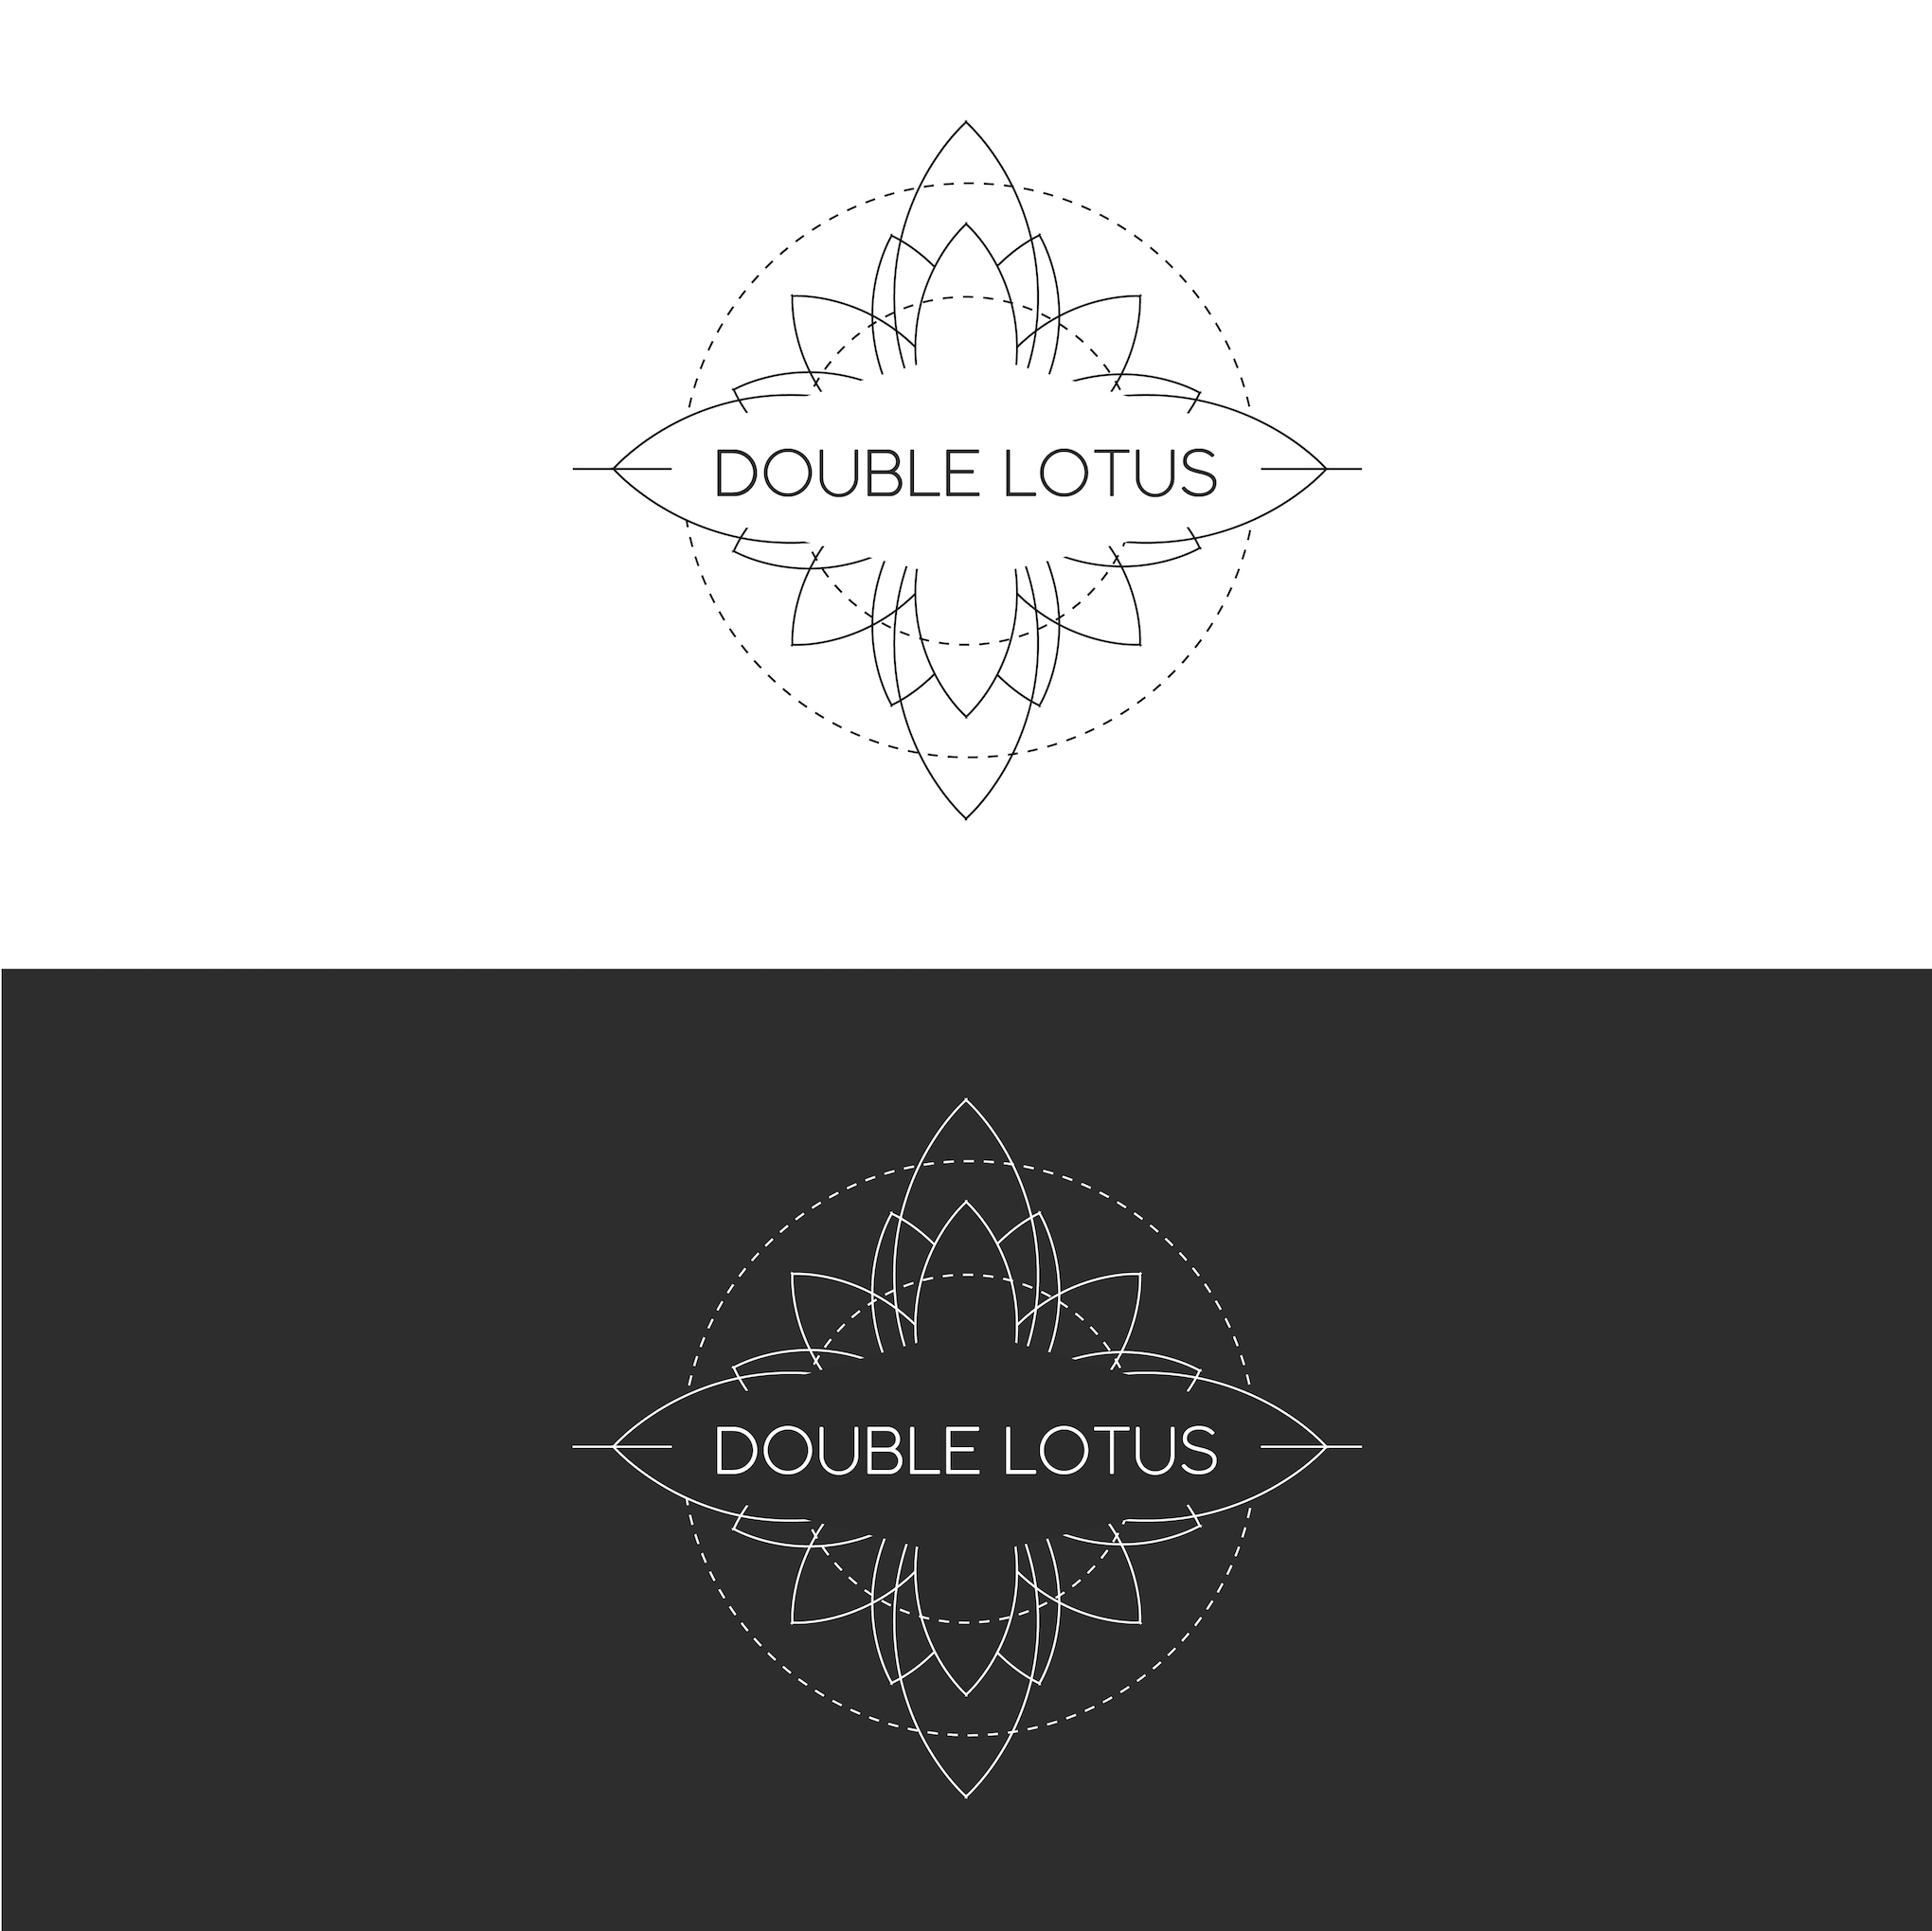 doublelotus_logo-02.jpg